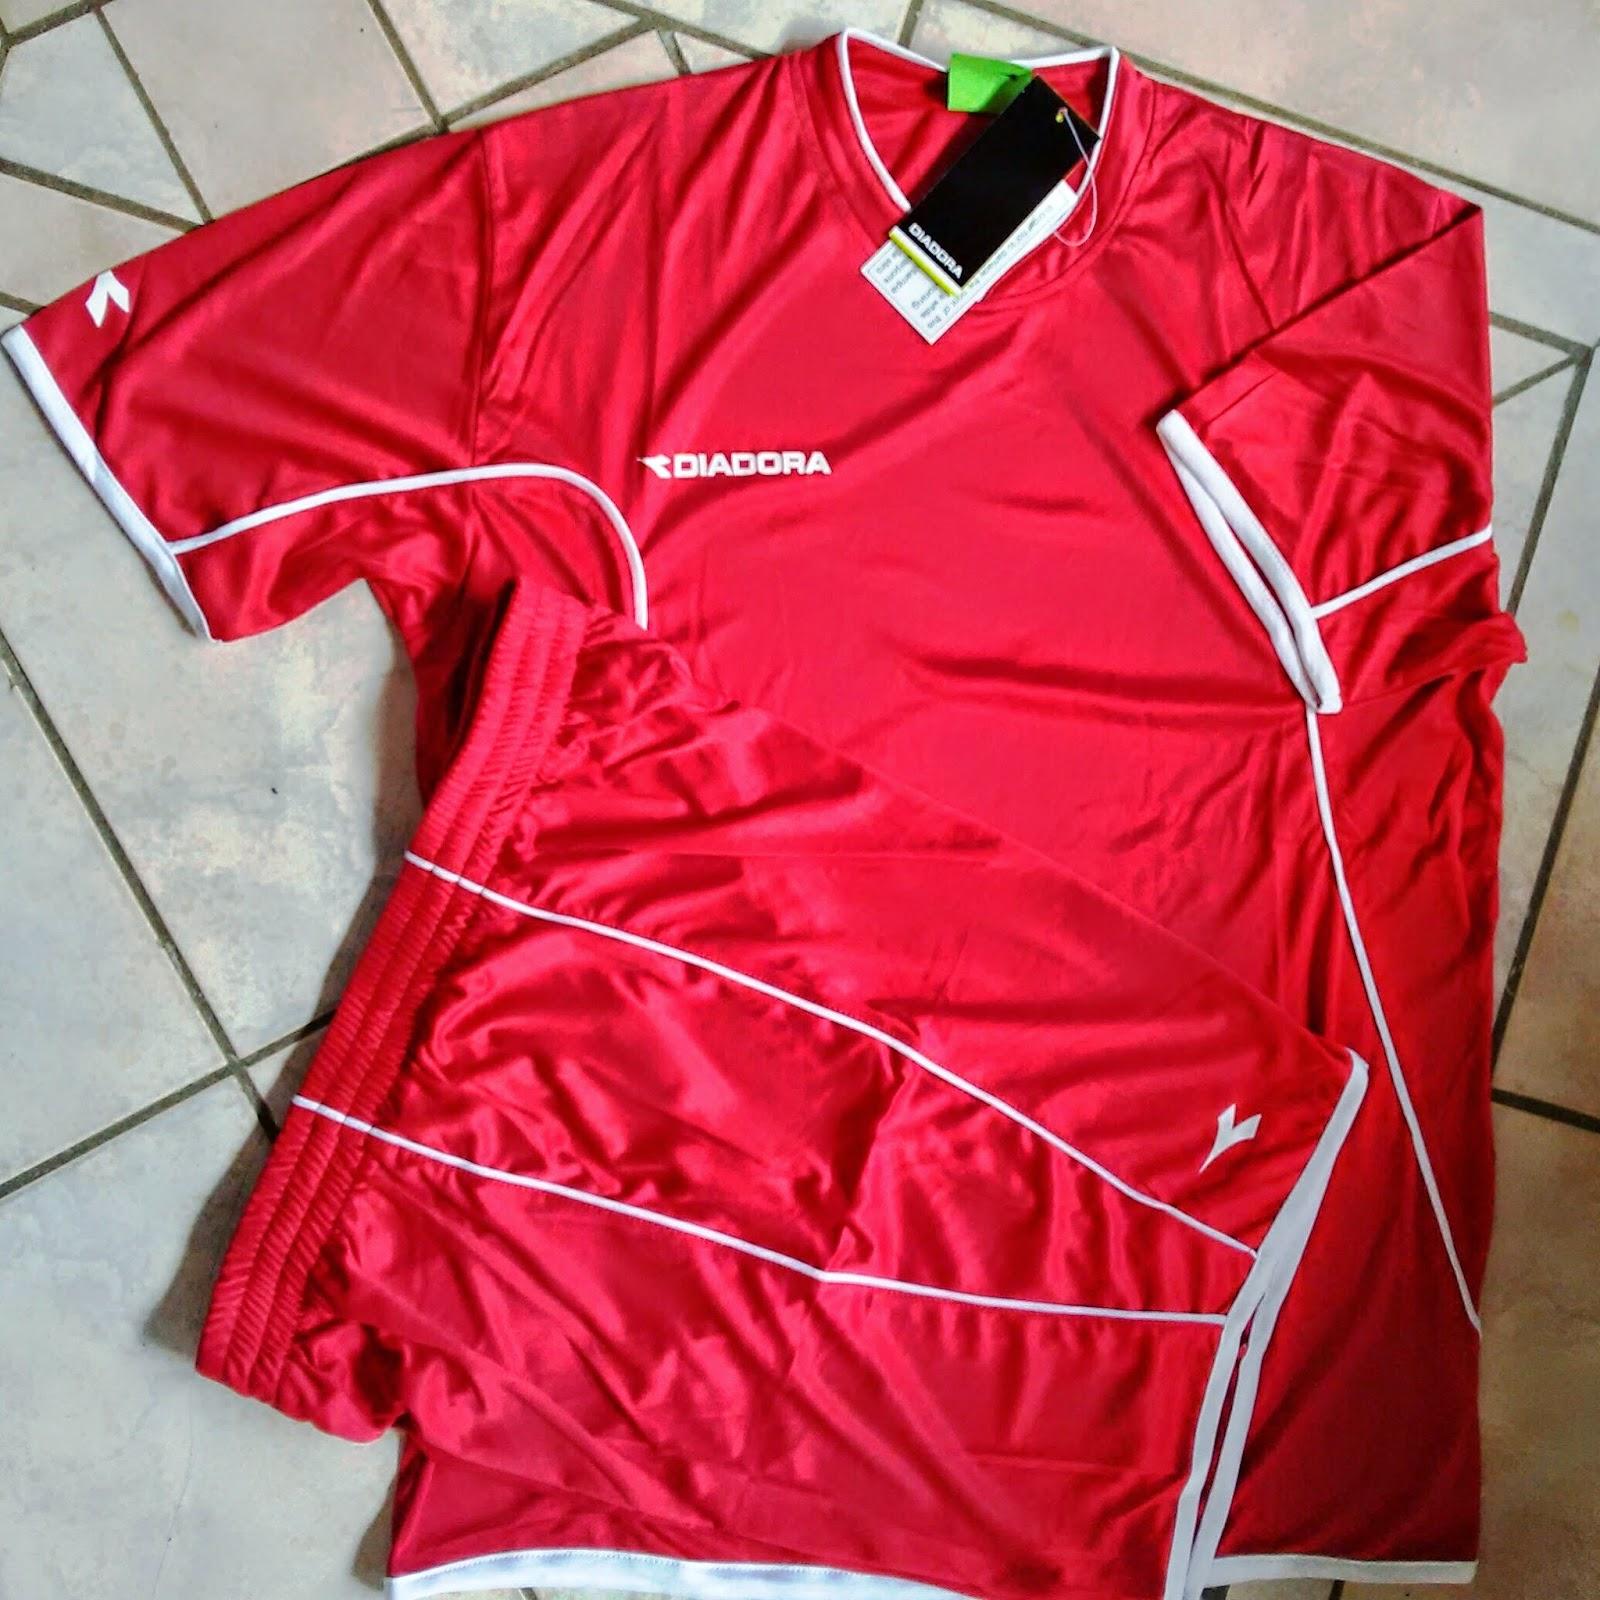 f5c3d0da7 Tradesia Sports Development Equipment and Kits  Diadora Soccer Kits ...